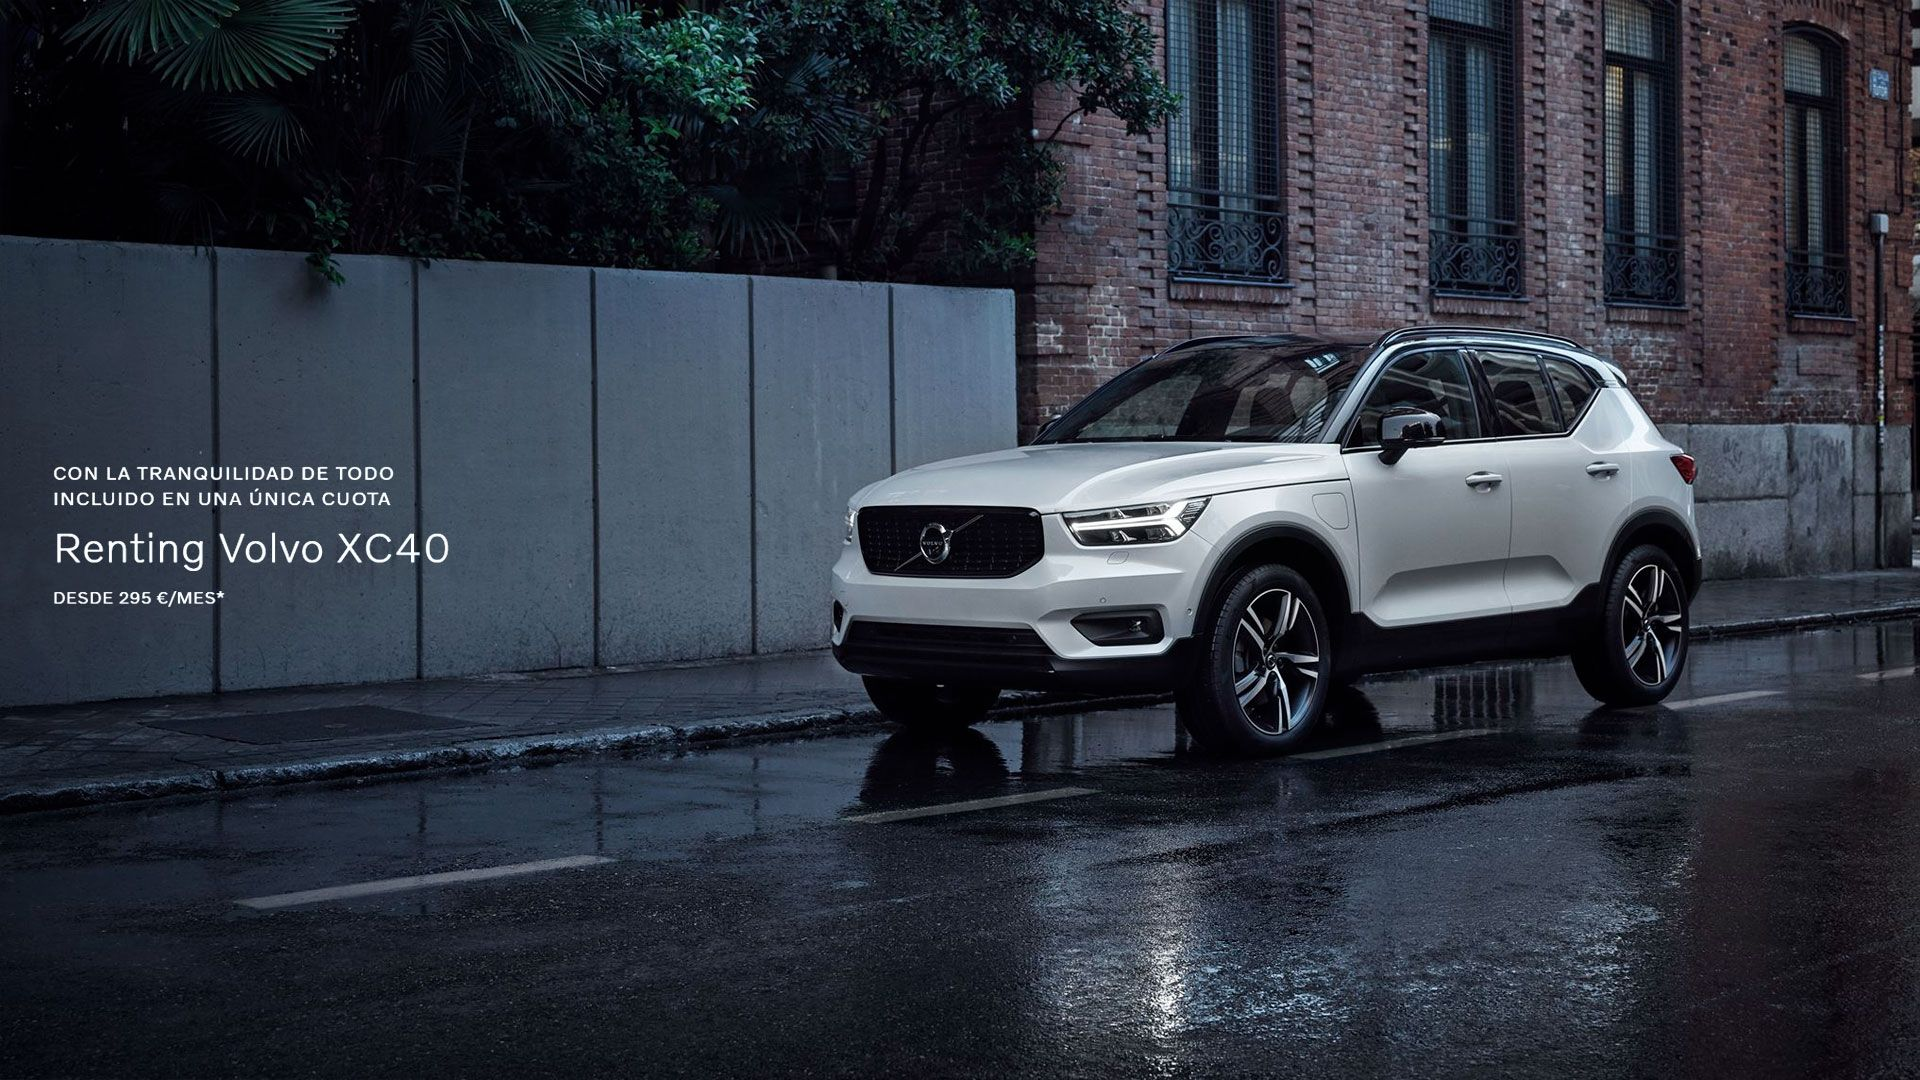 Renting Volvo XC40